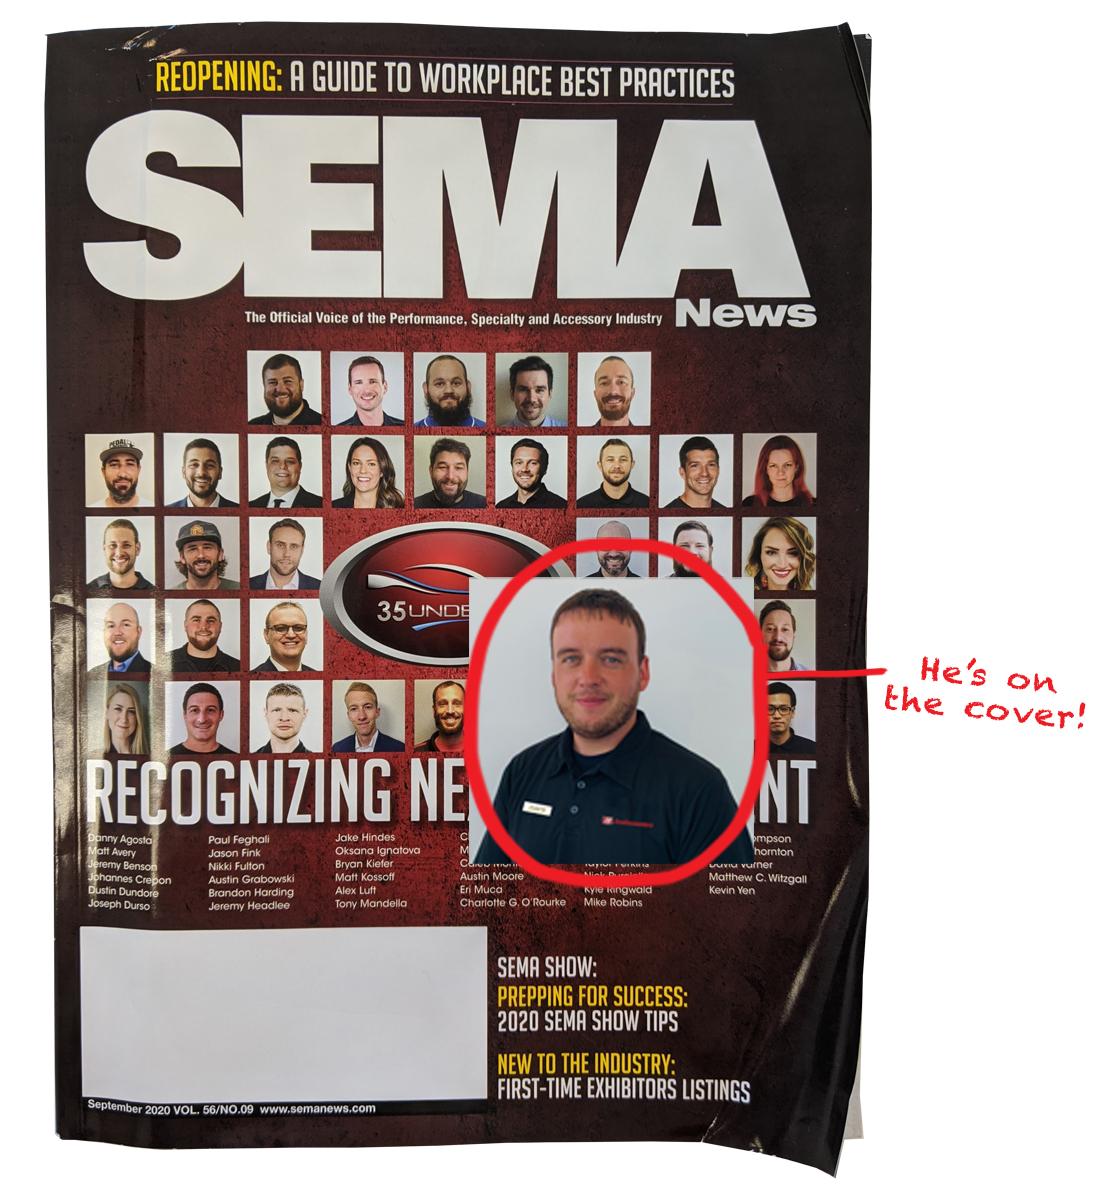 SEMA News